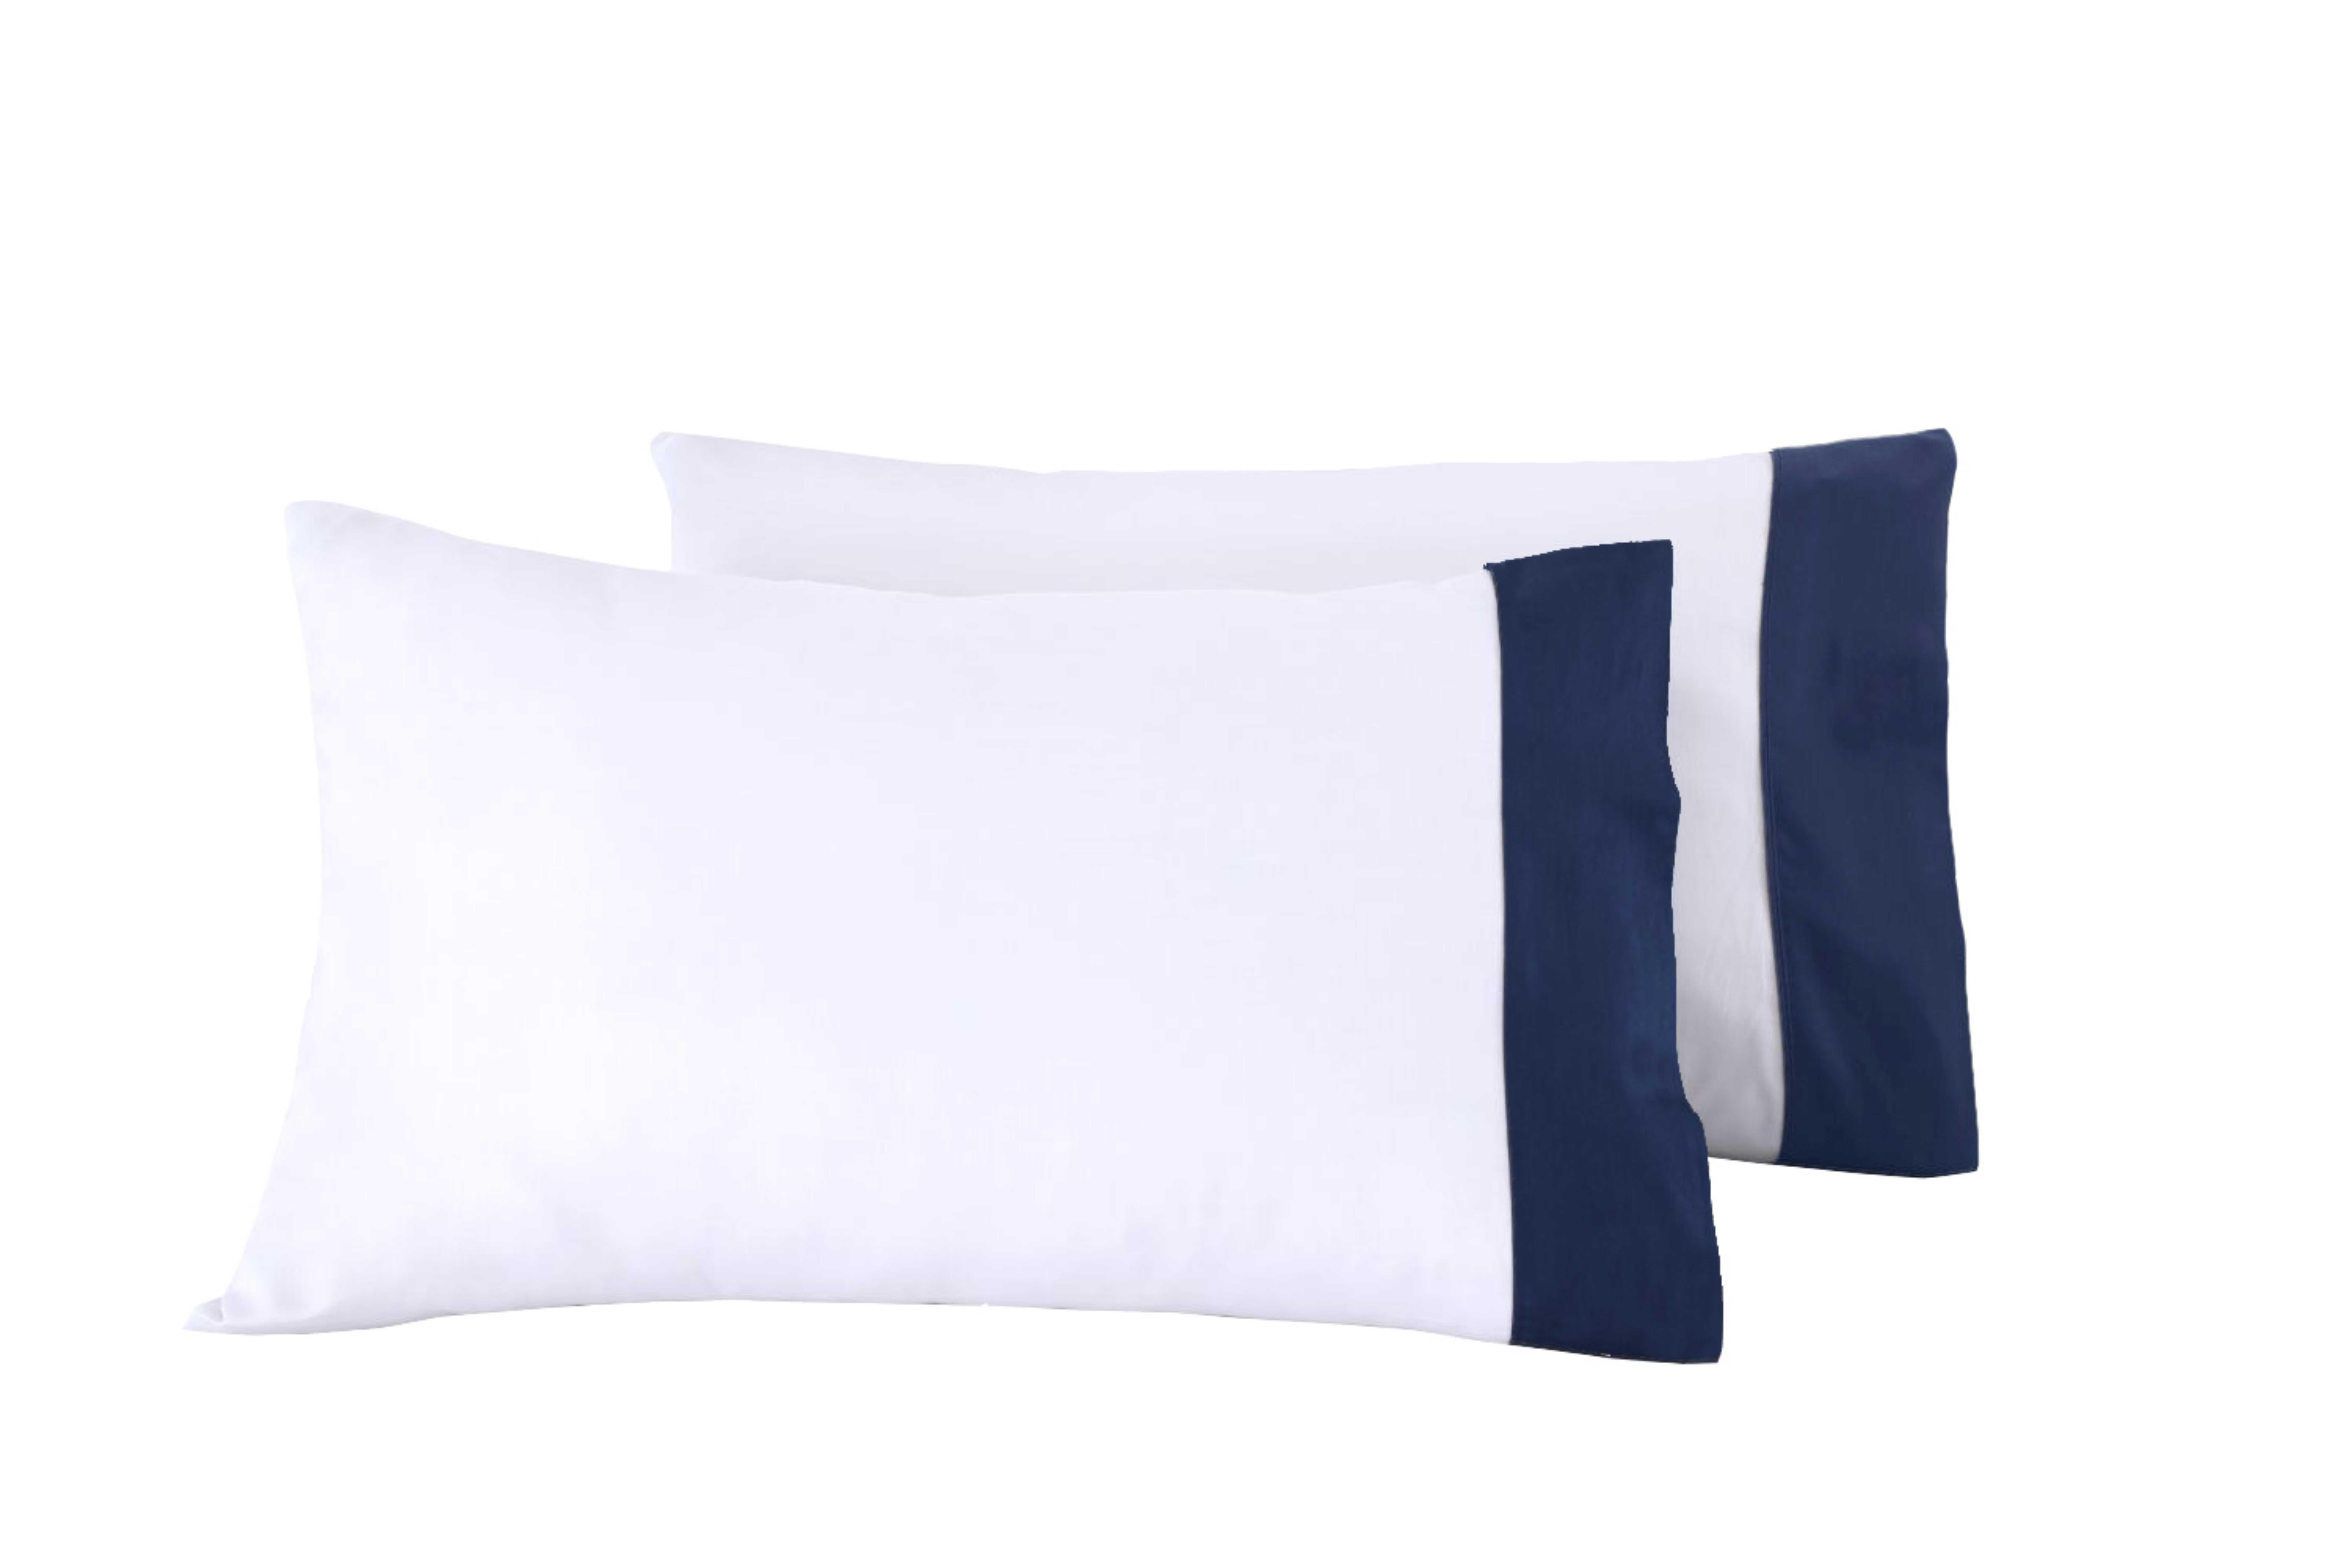 Egyptian Cotton Pillowcase Sheets Pillowcases You Ll Love In 2021 Wayfair